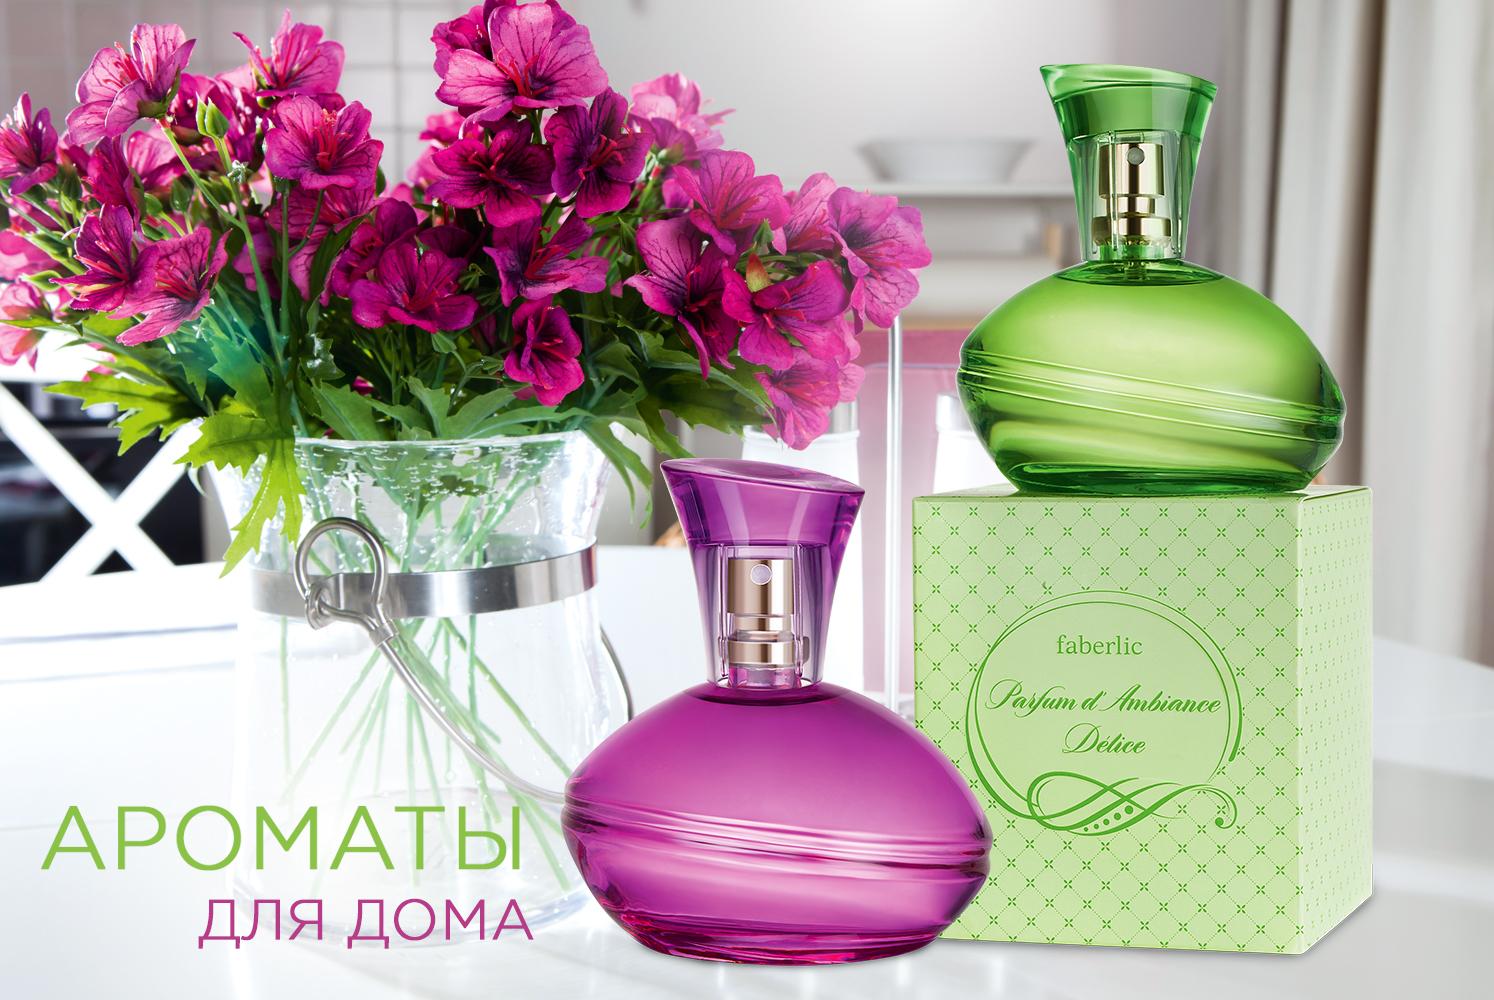 23 Aromat 5 2016 promo